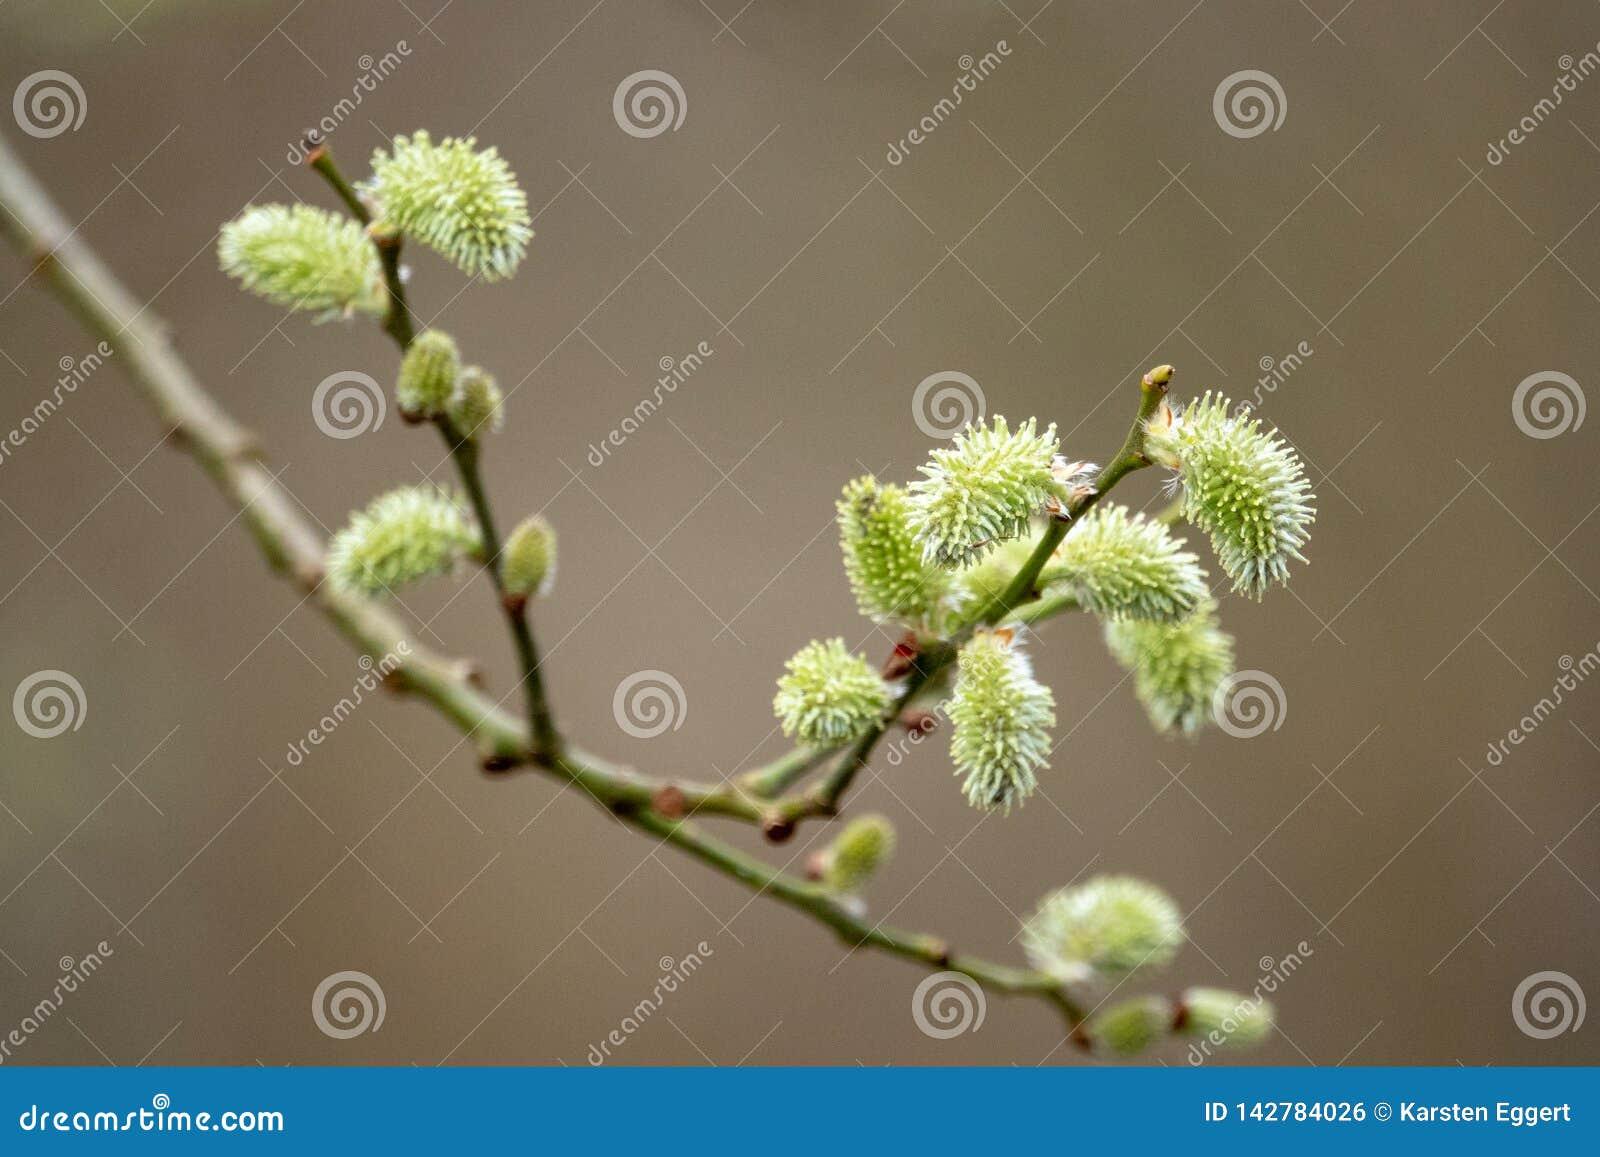 Junge Knospen im Frühjahr